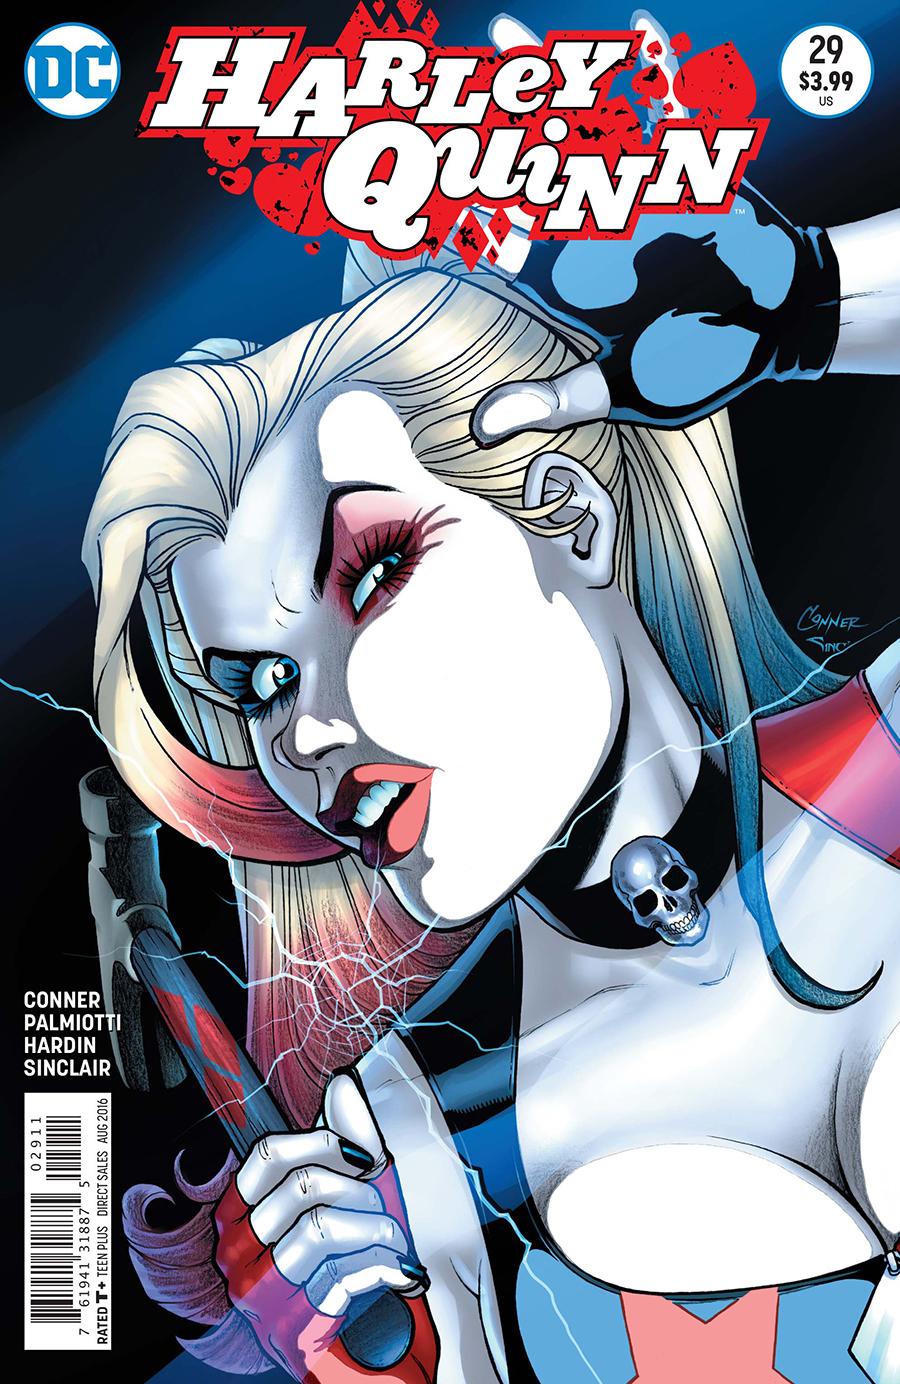 Harley Quinn 29 Reviews